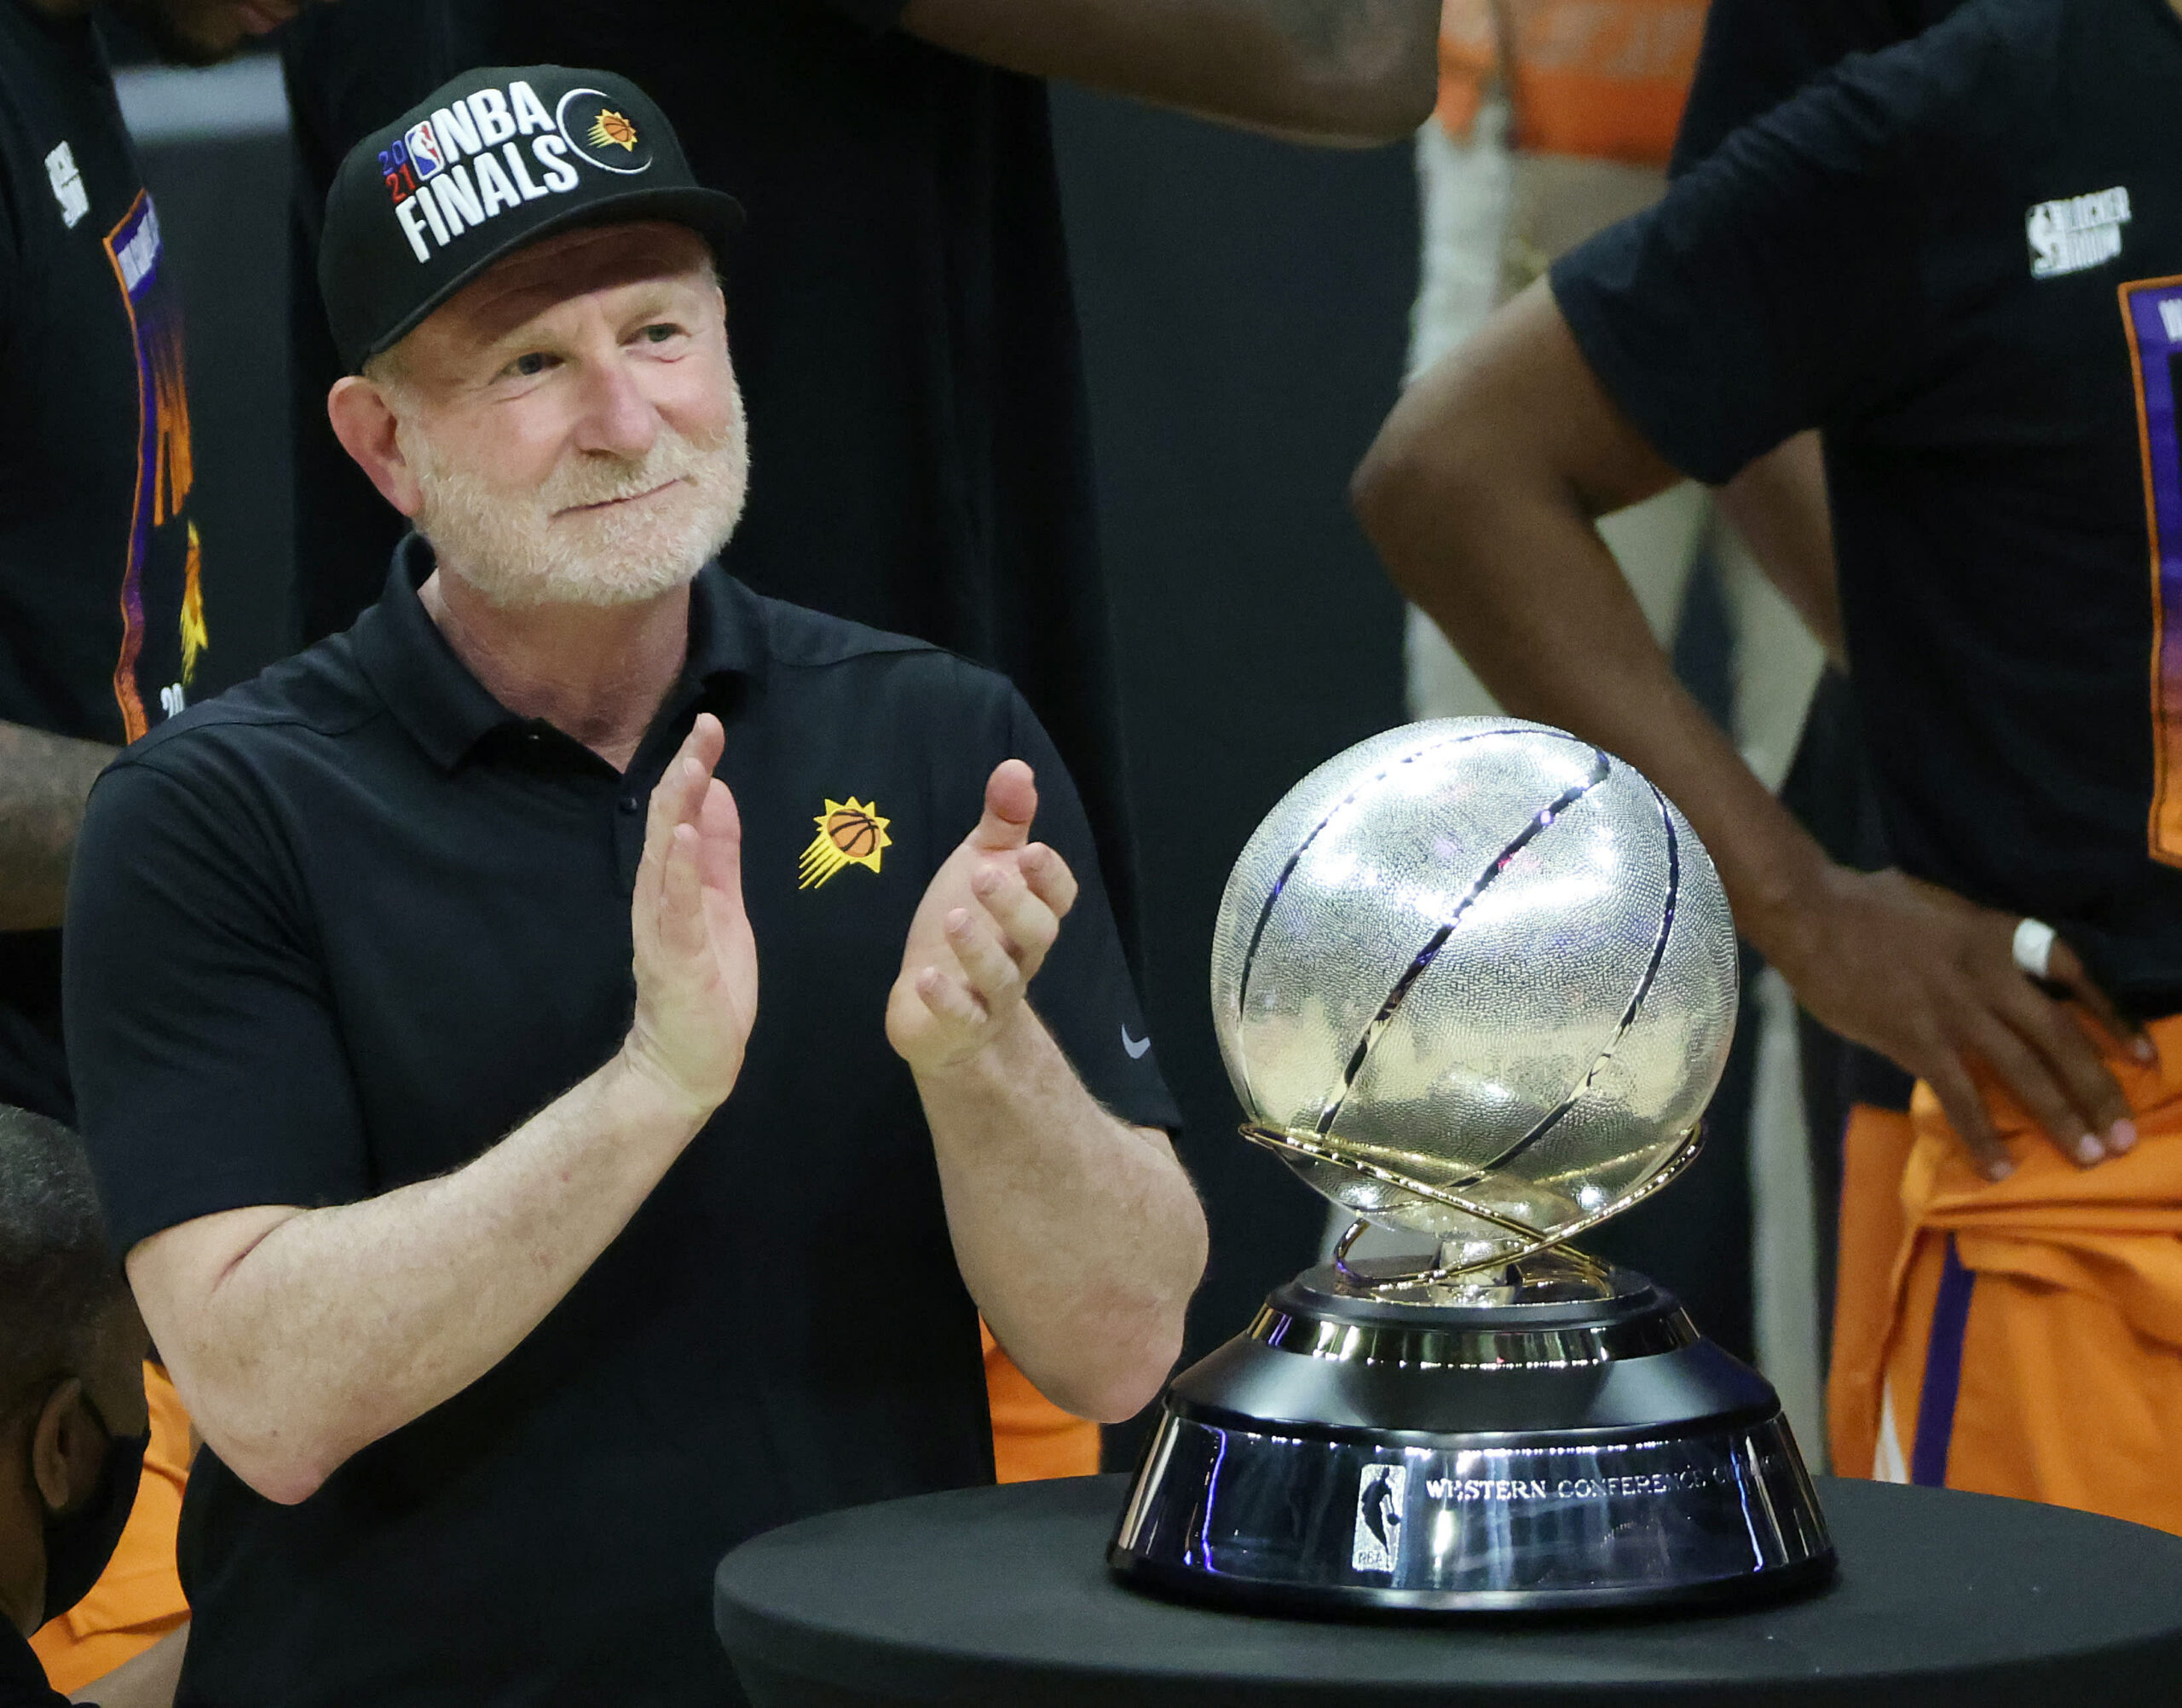 Phoenix Suns deny owner Robert Sarver is racist, sexist ahead of possible ESPN report